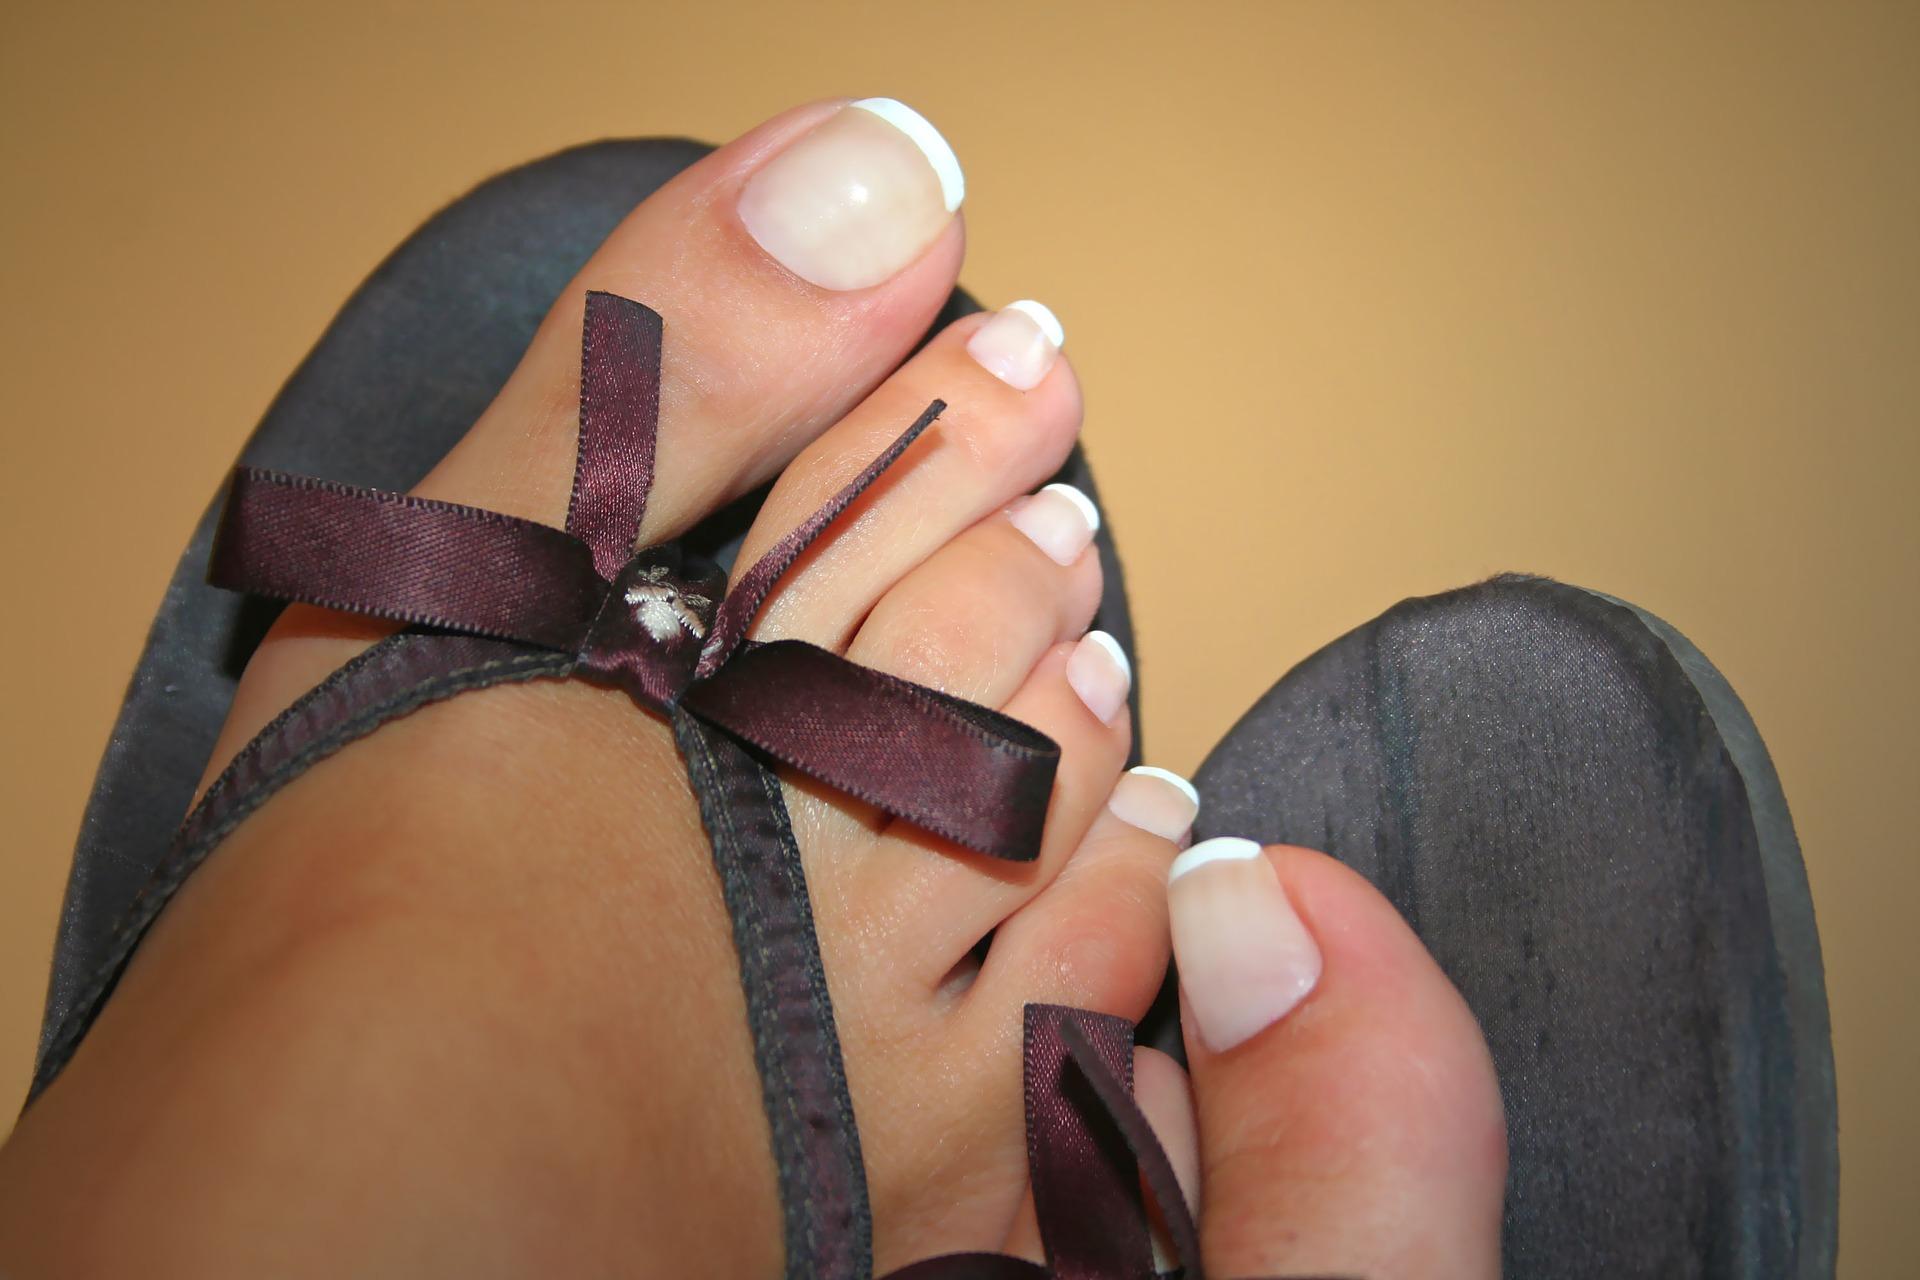 toe-nails-1564964_1920